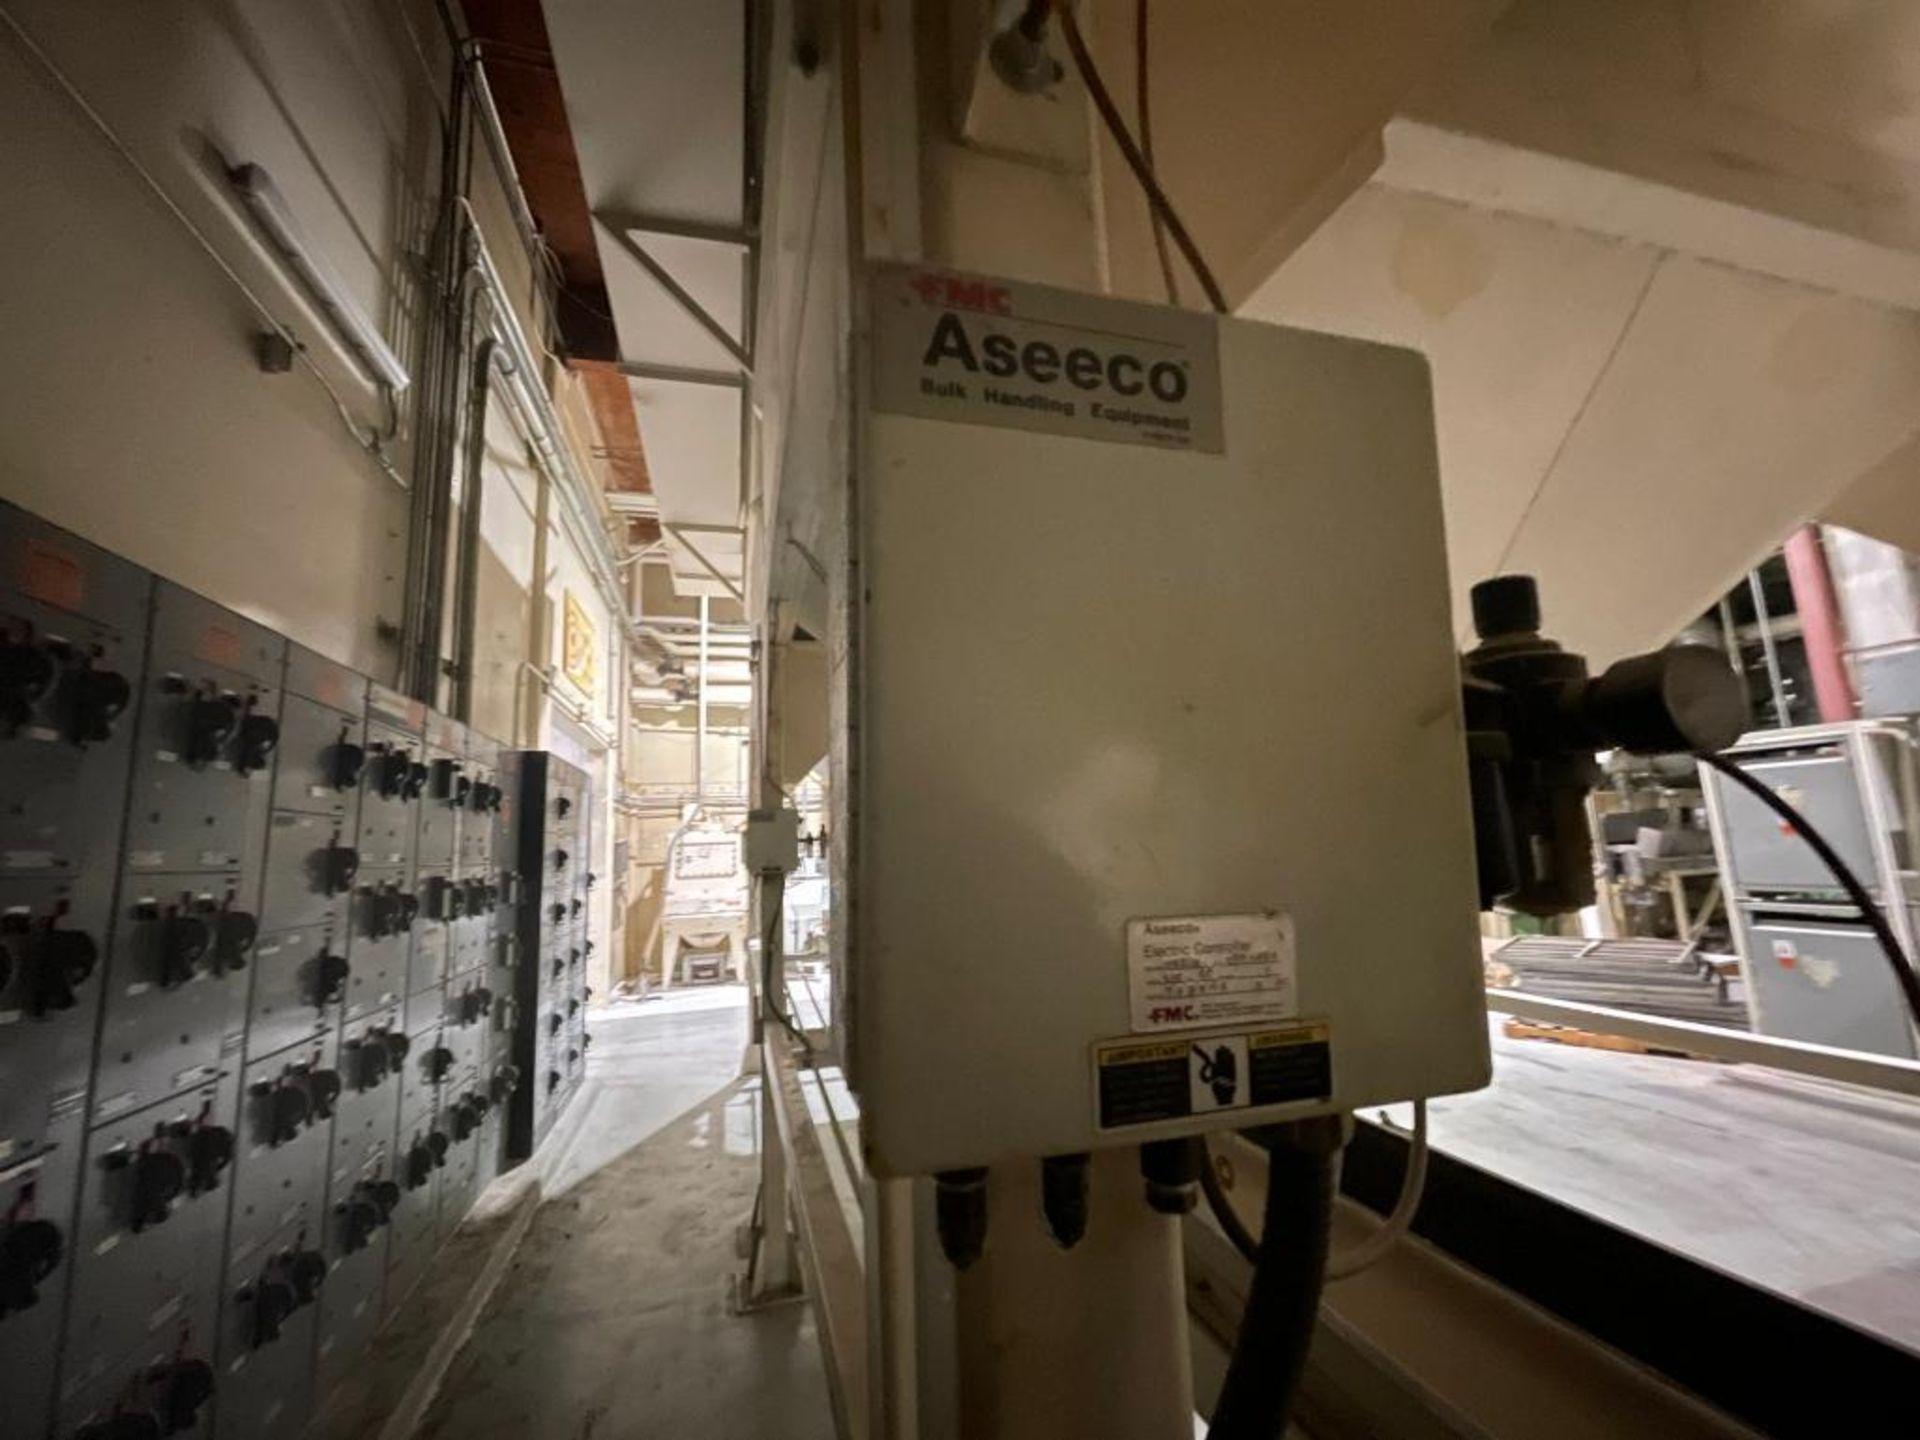 Aseeco mild steel cone bottom bulk storage bin - Image 17 of 28